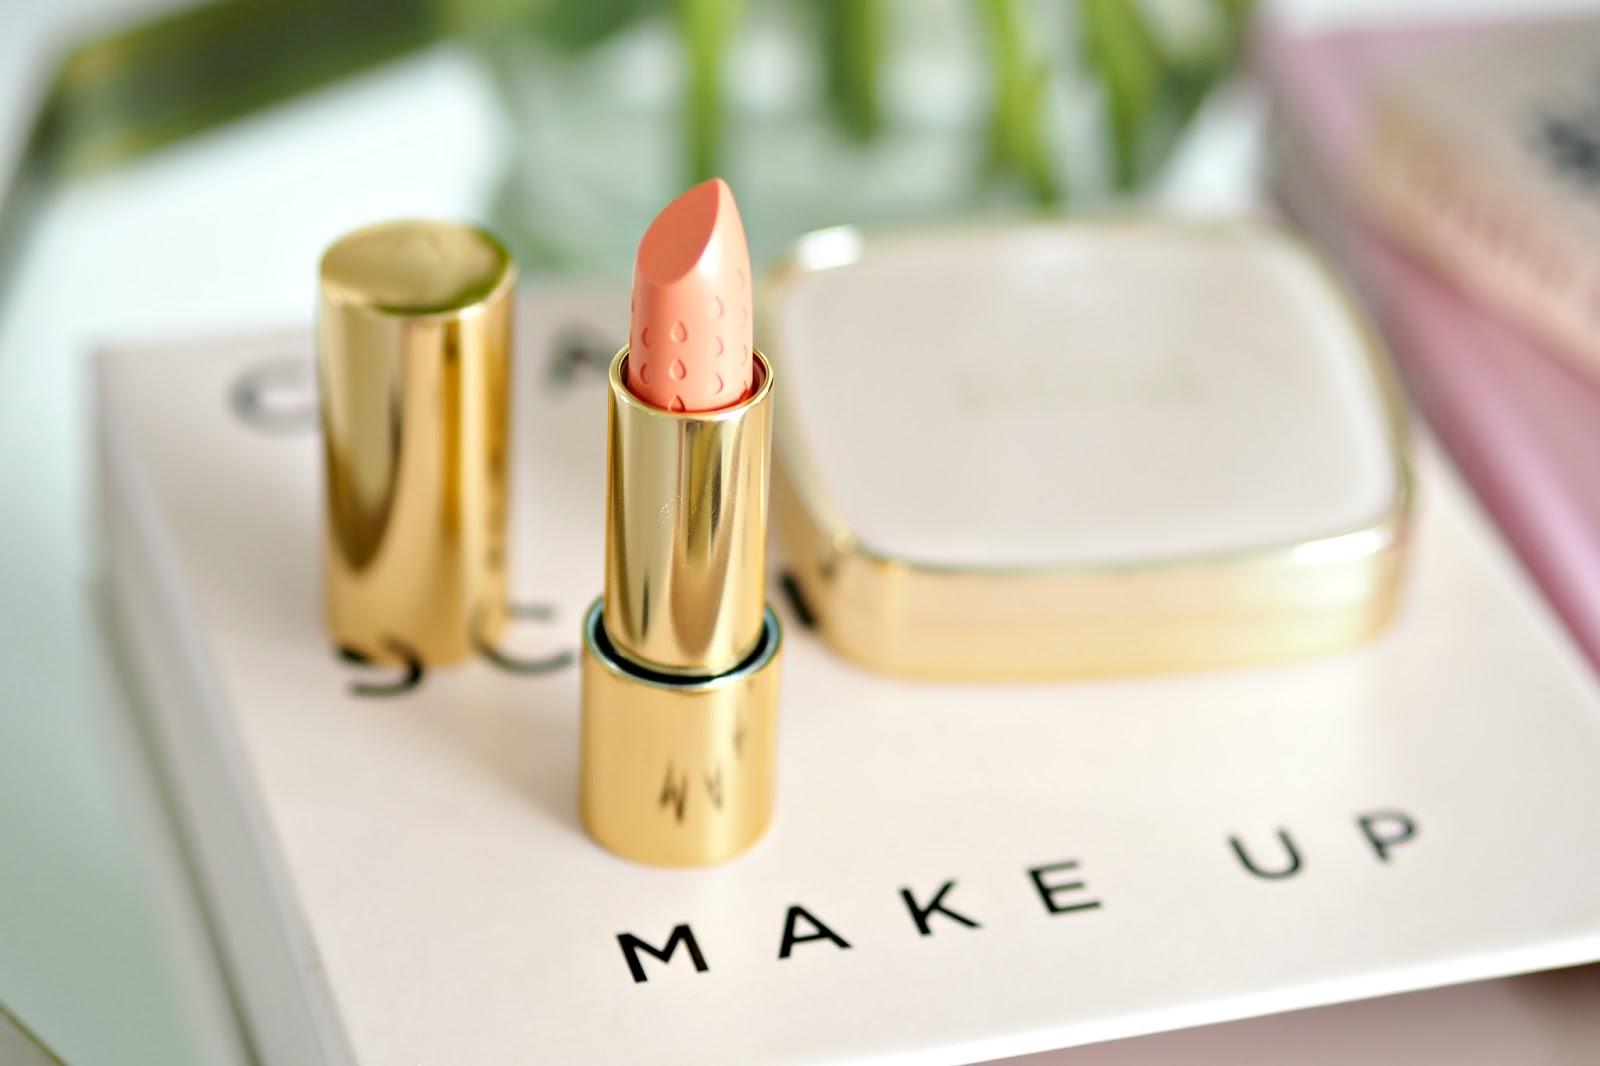 Claudia Schiffer Cream Lipstick shade 180 - Peach Club